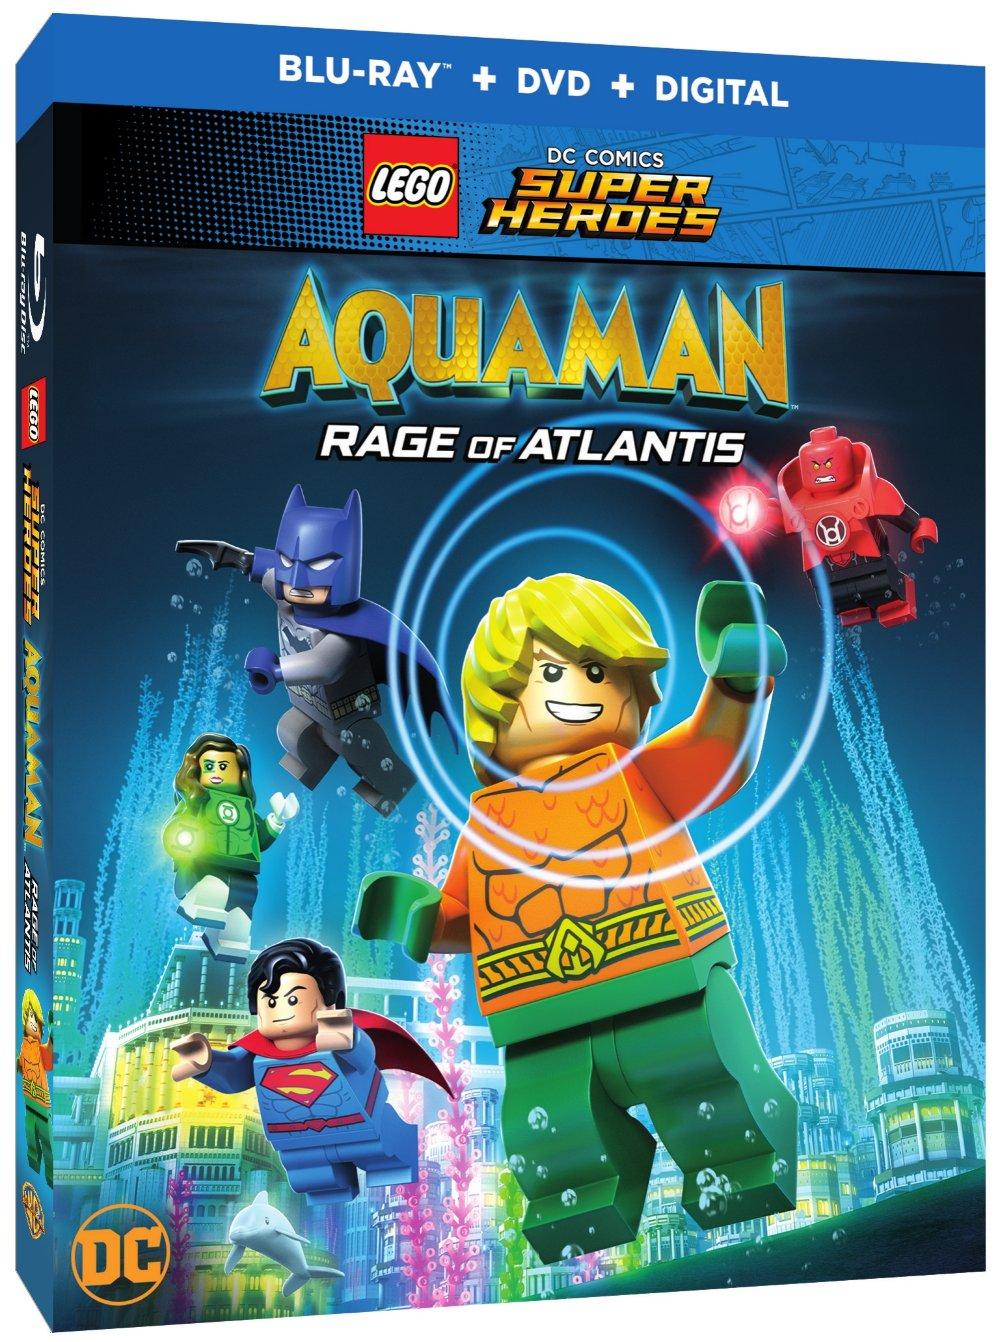 DCSH Aquaman 3D BD.JPEG